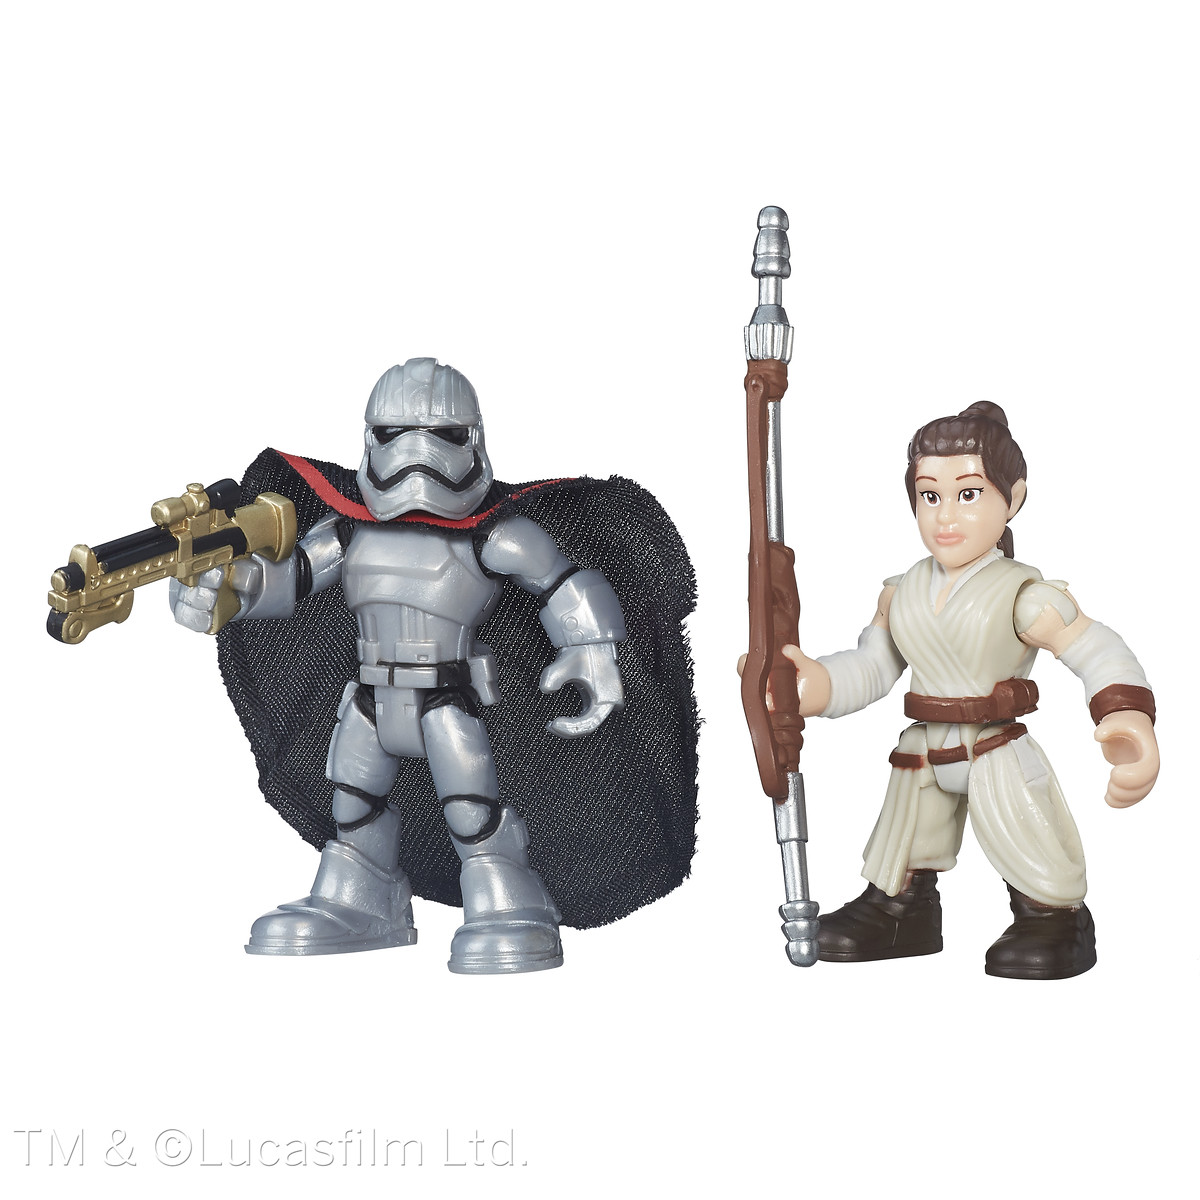 "Star Wars The Force Awakens Hero Rey Action Figure Toy Hasbro Skywalker 6"" Boxed"